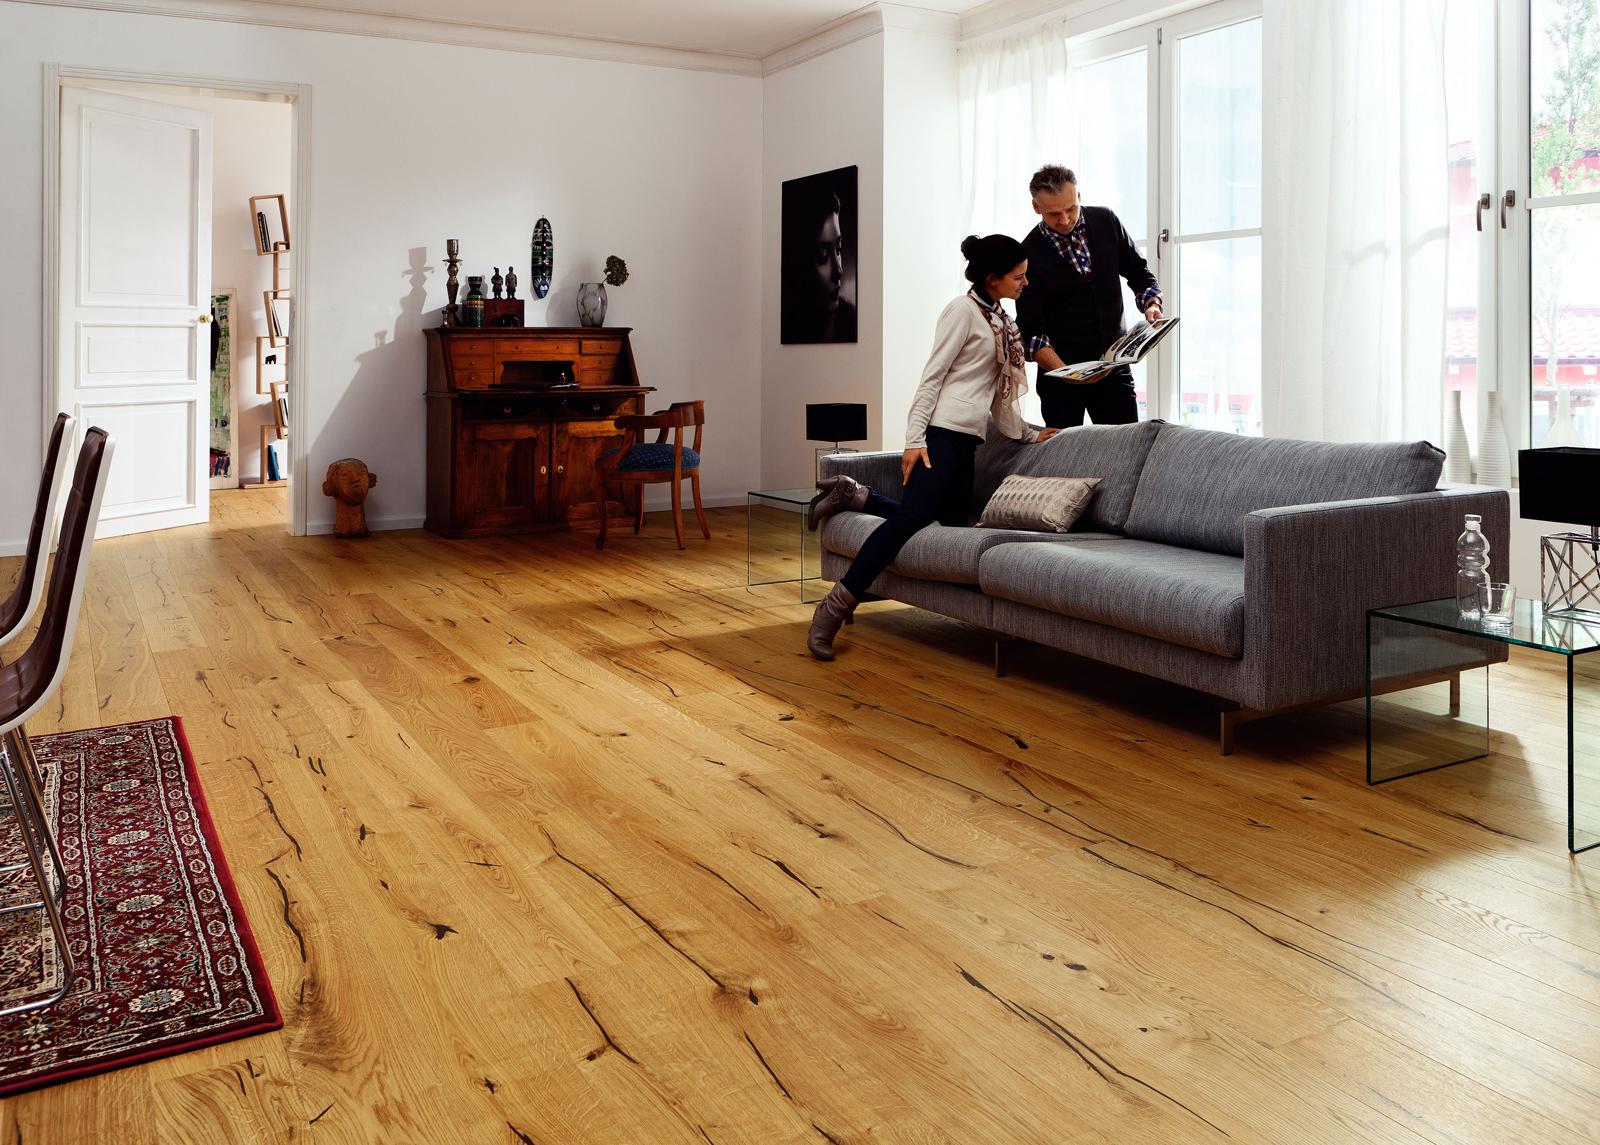 haro landhausdiele parkett. Black Bedroom Furniture Sets. Home Design Ideas